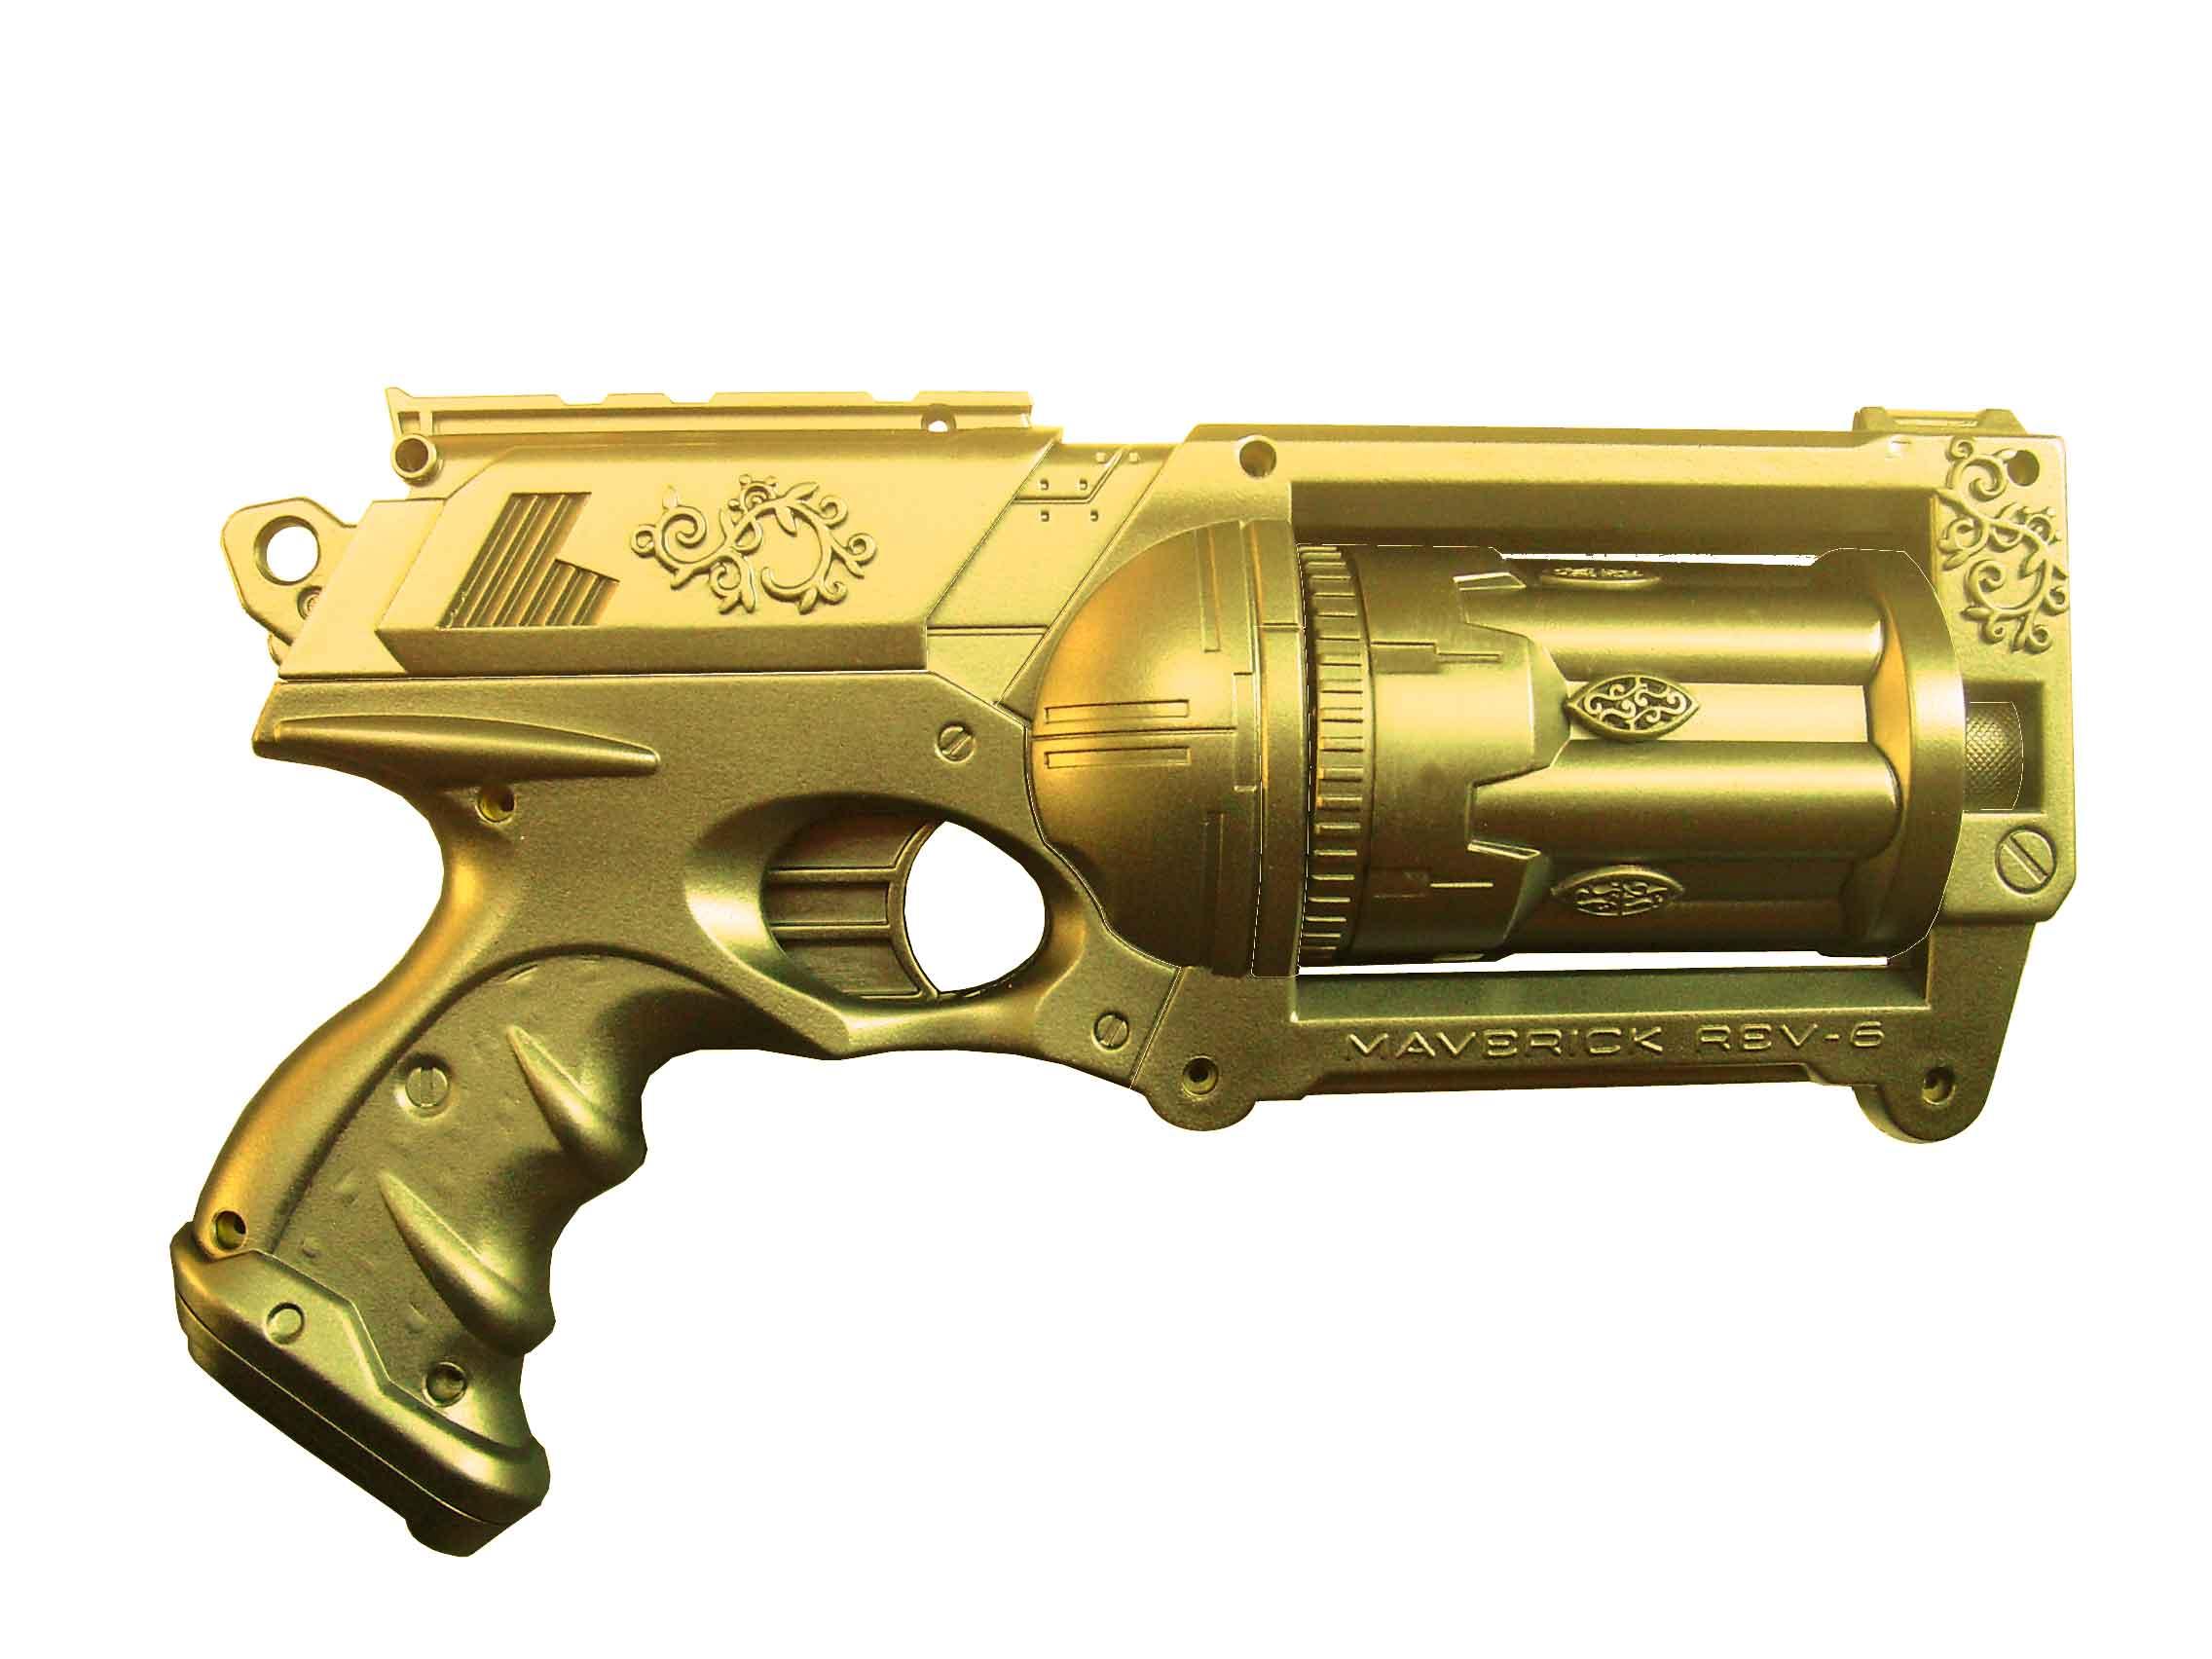 Nerf Maverick gold